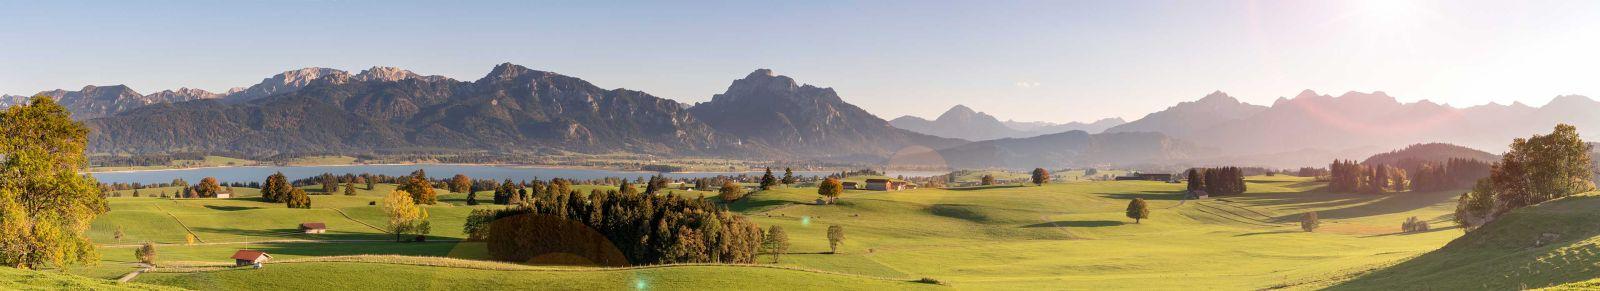 RINGTREUHAND Allgäu: Steuerberater im Allgäu (Kaufbeuren)